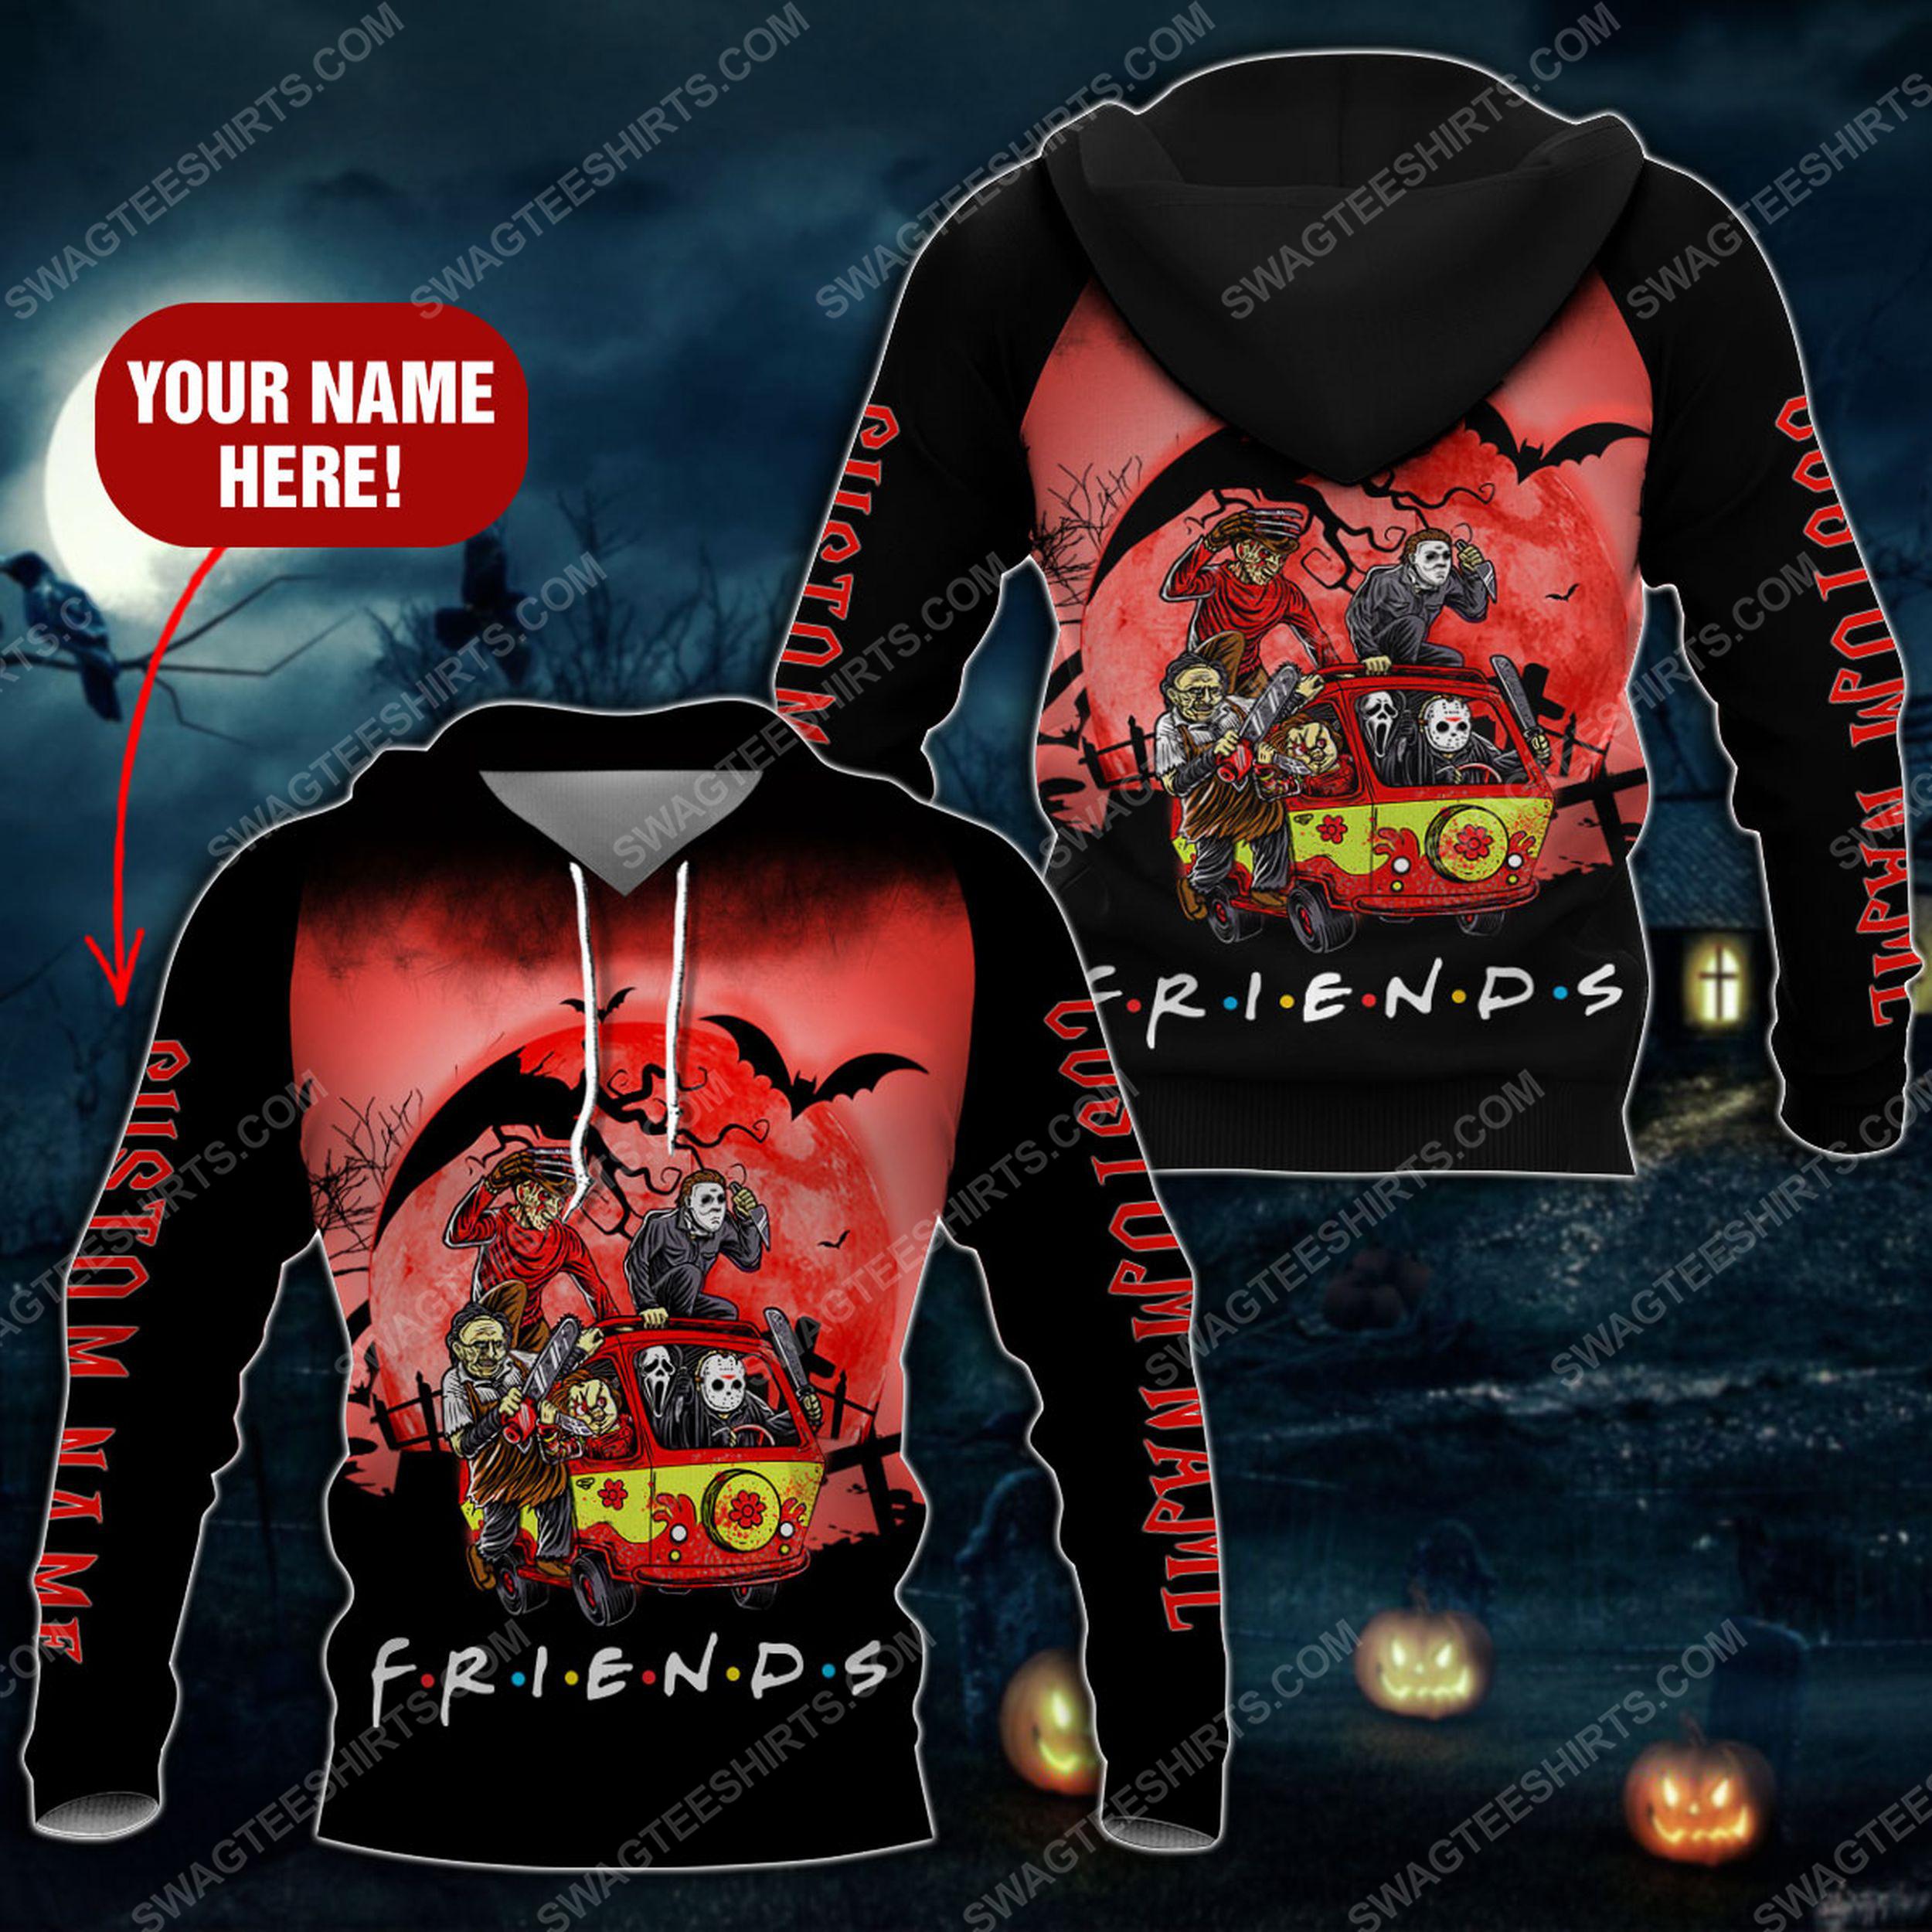 Custom halloween horror movie villains friends tv show full printing shirt 2(1)